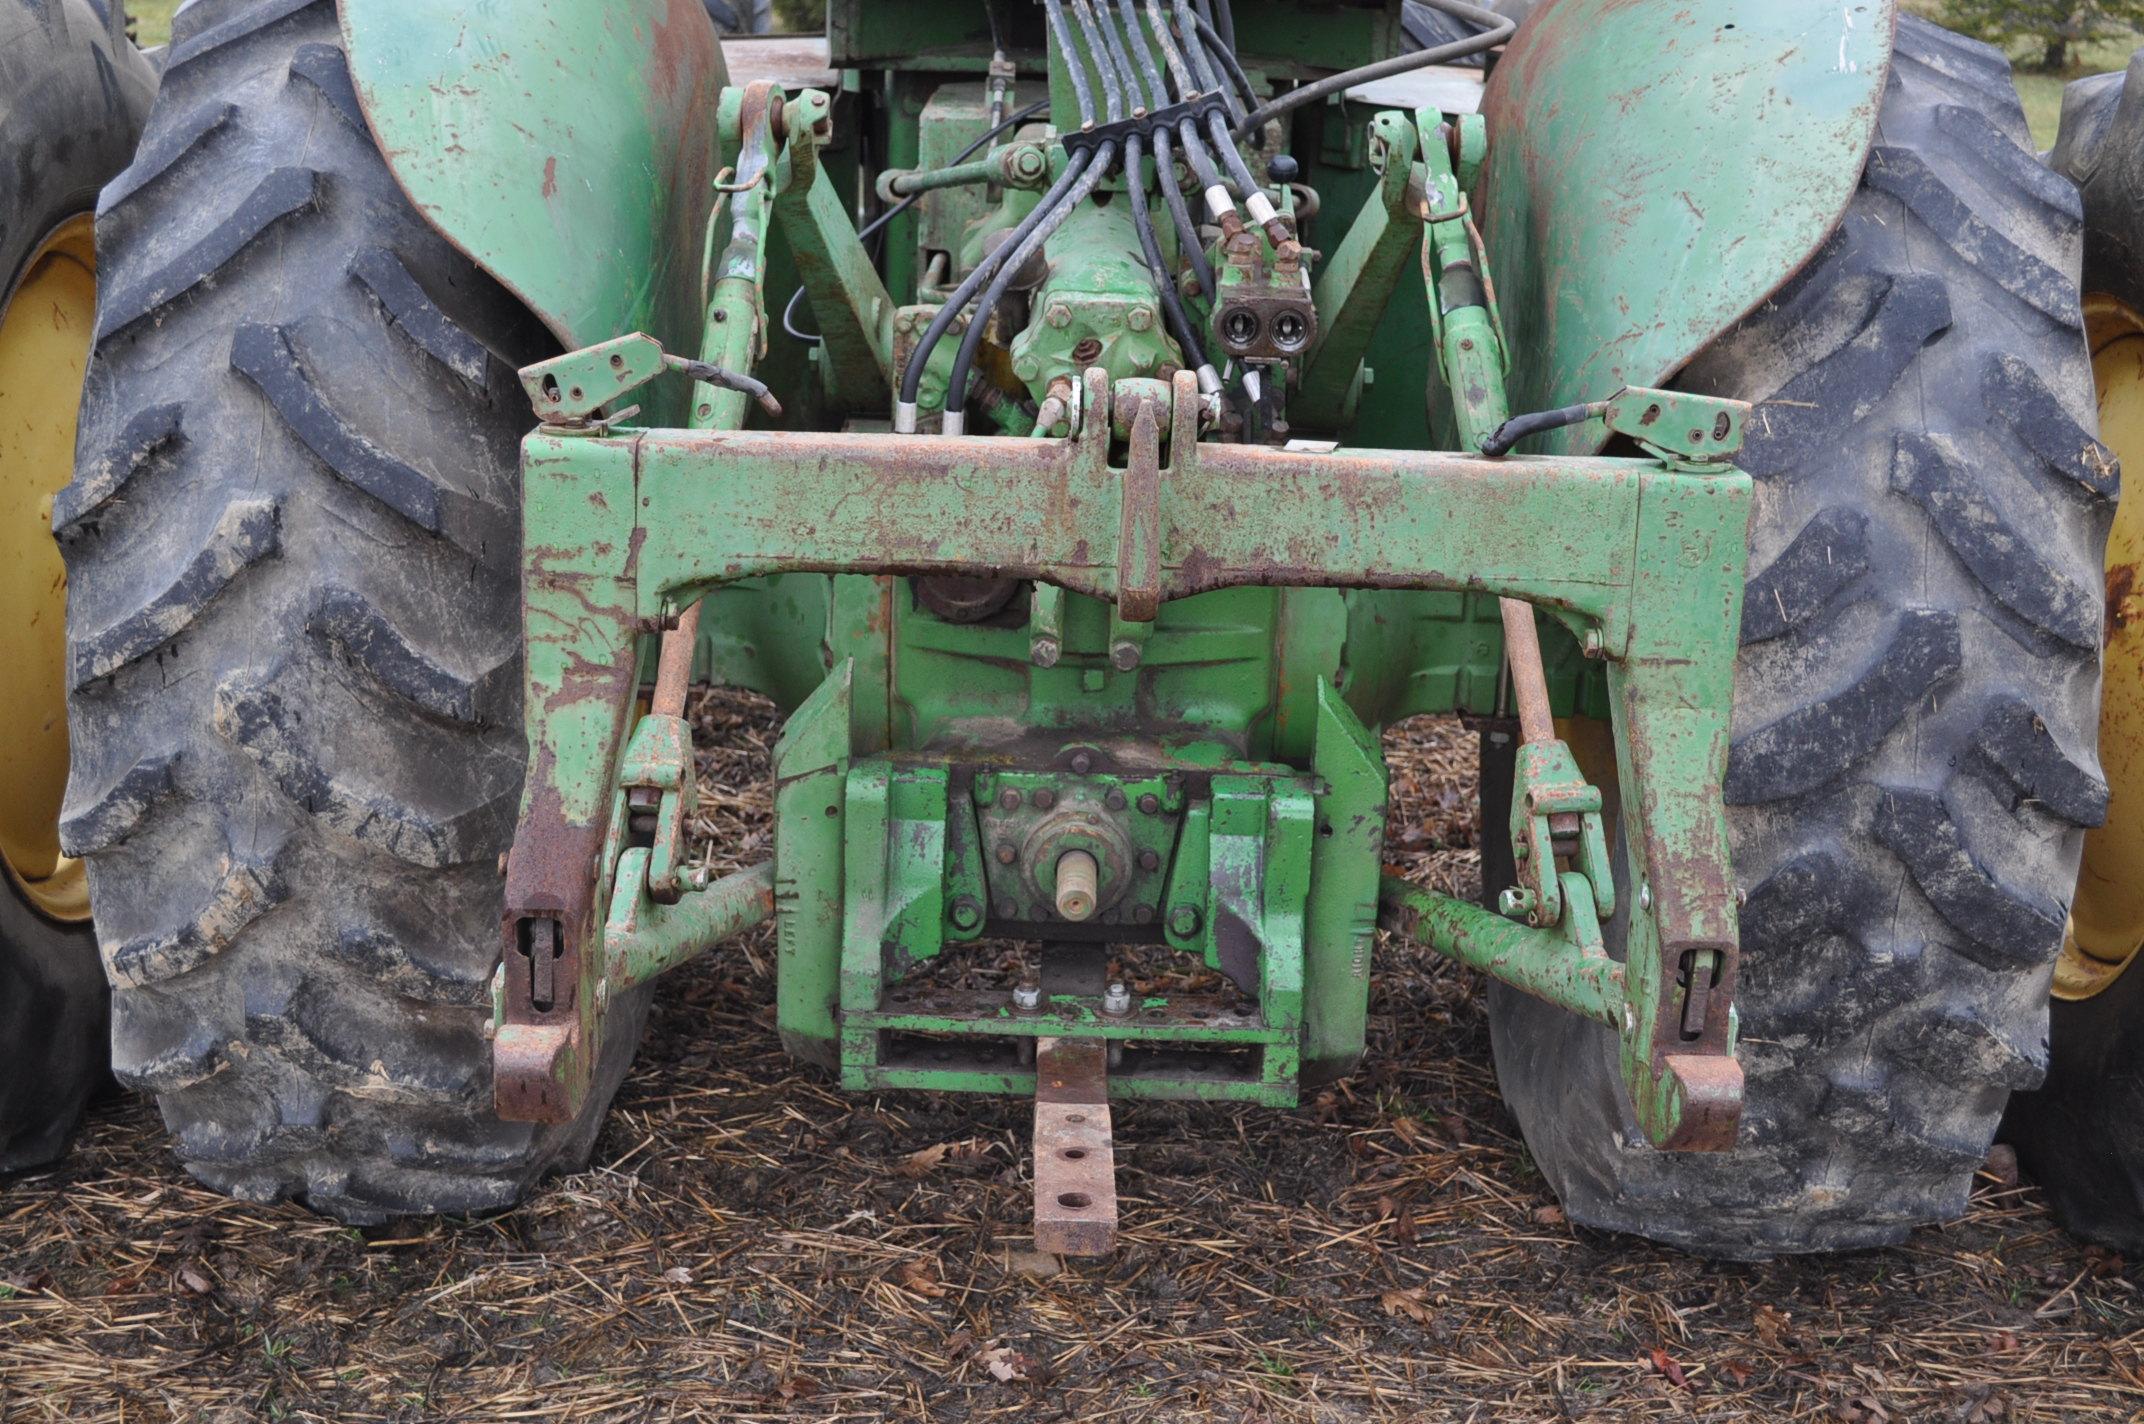 John Deere 7520 tractor, 4WD, diesel, 18.4-34 duals, original fenders, CHA, cab interior kit, 3 - Image 11 of 24